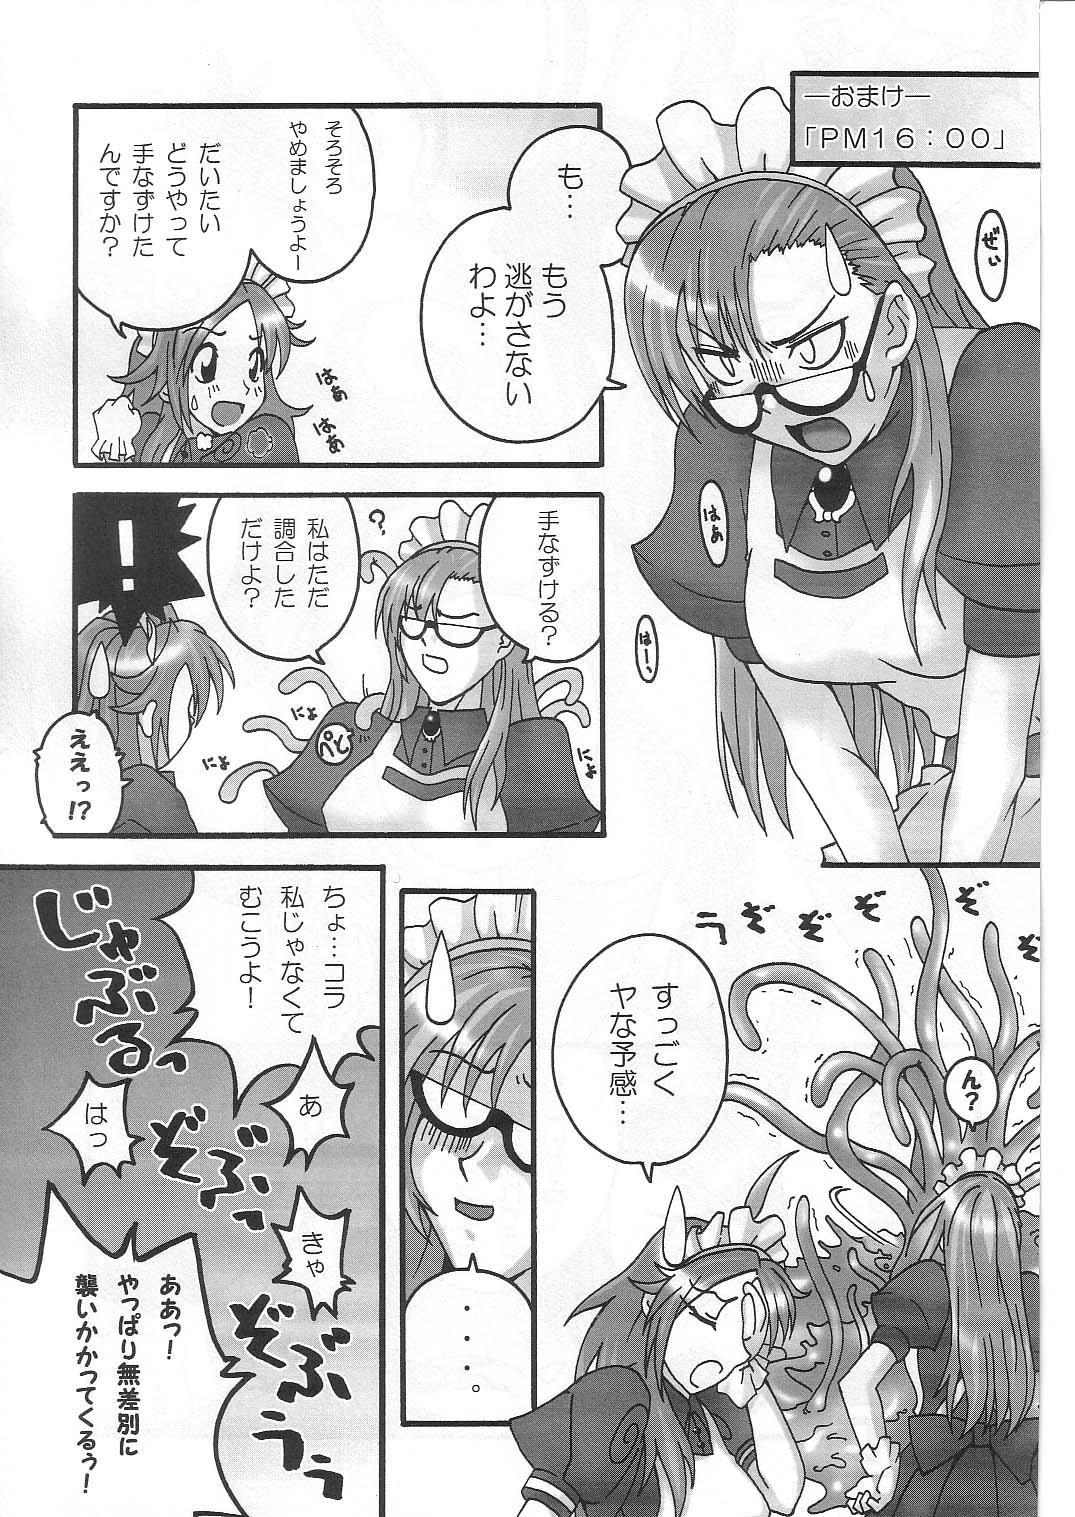 Kapura-san ga Koronda 30